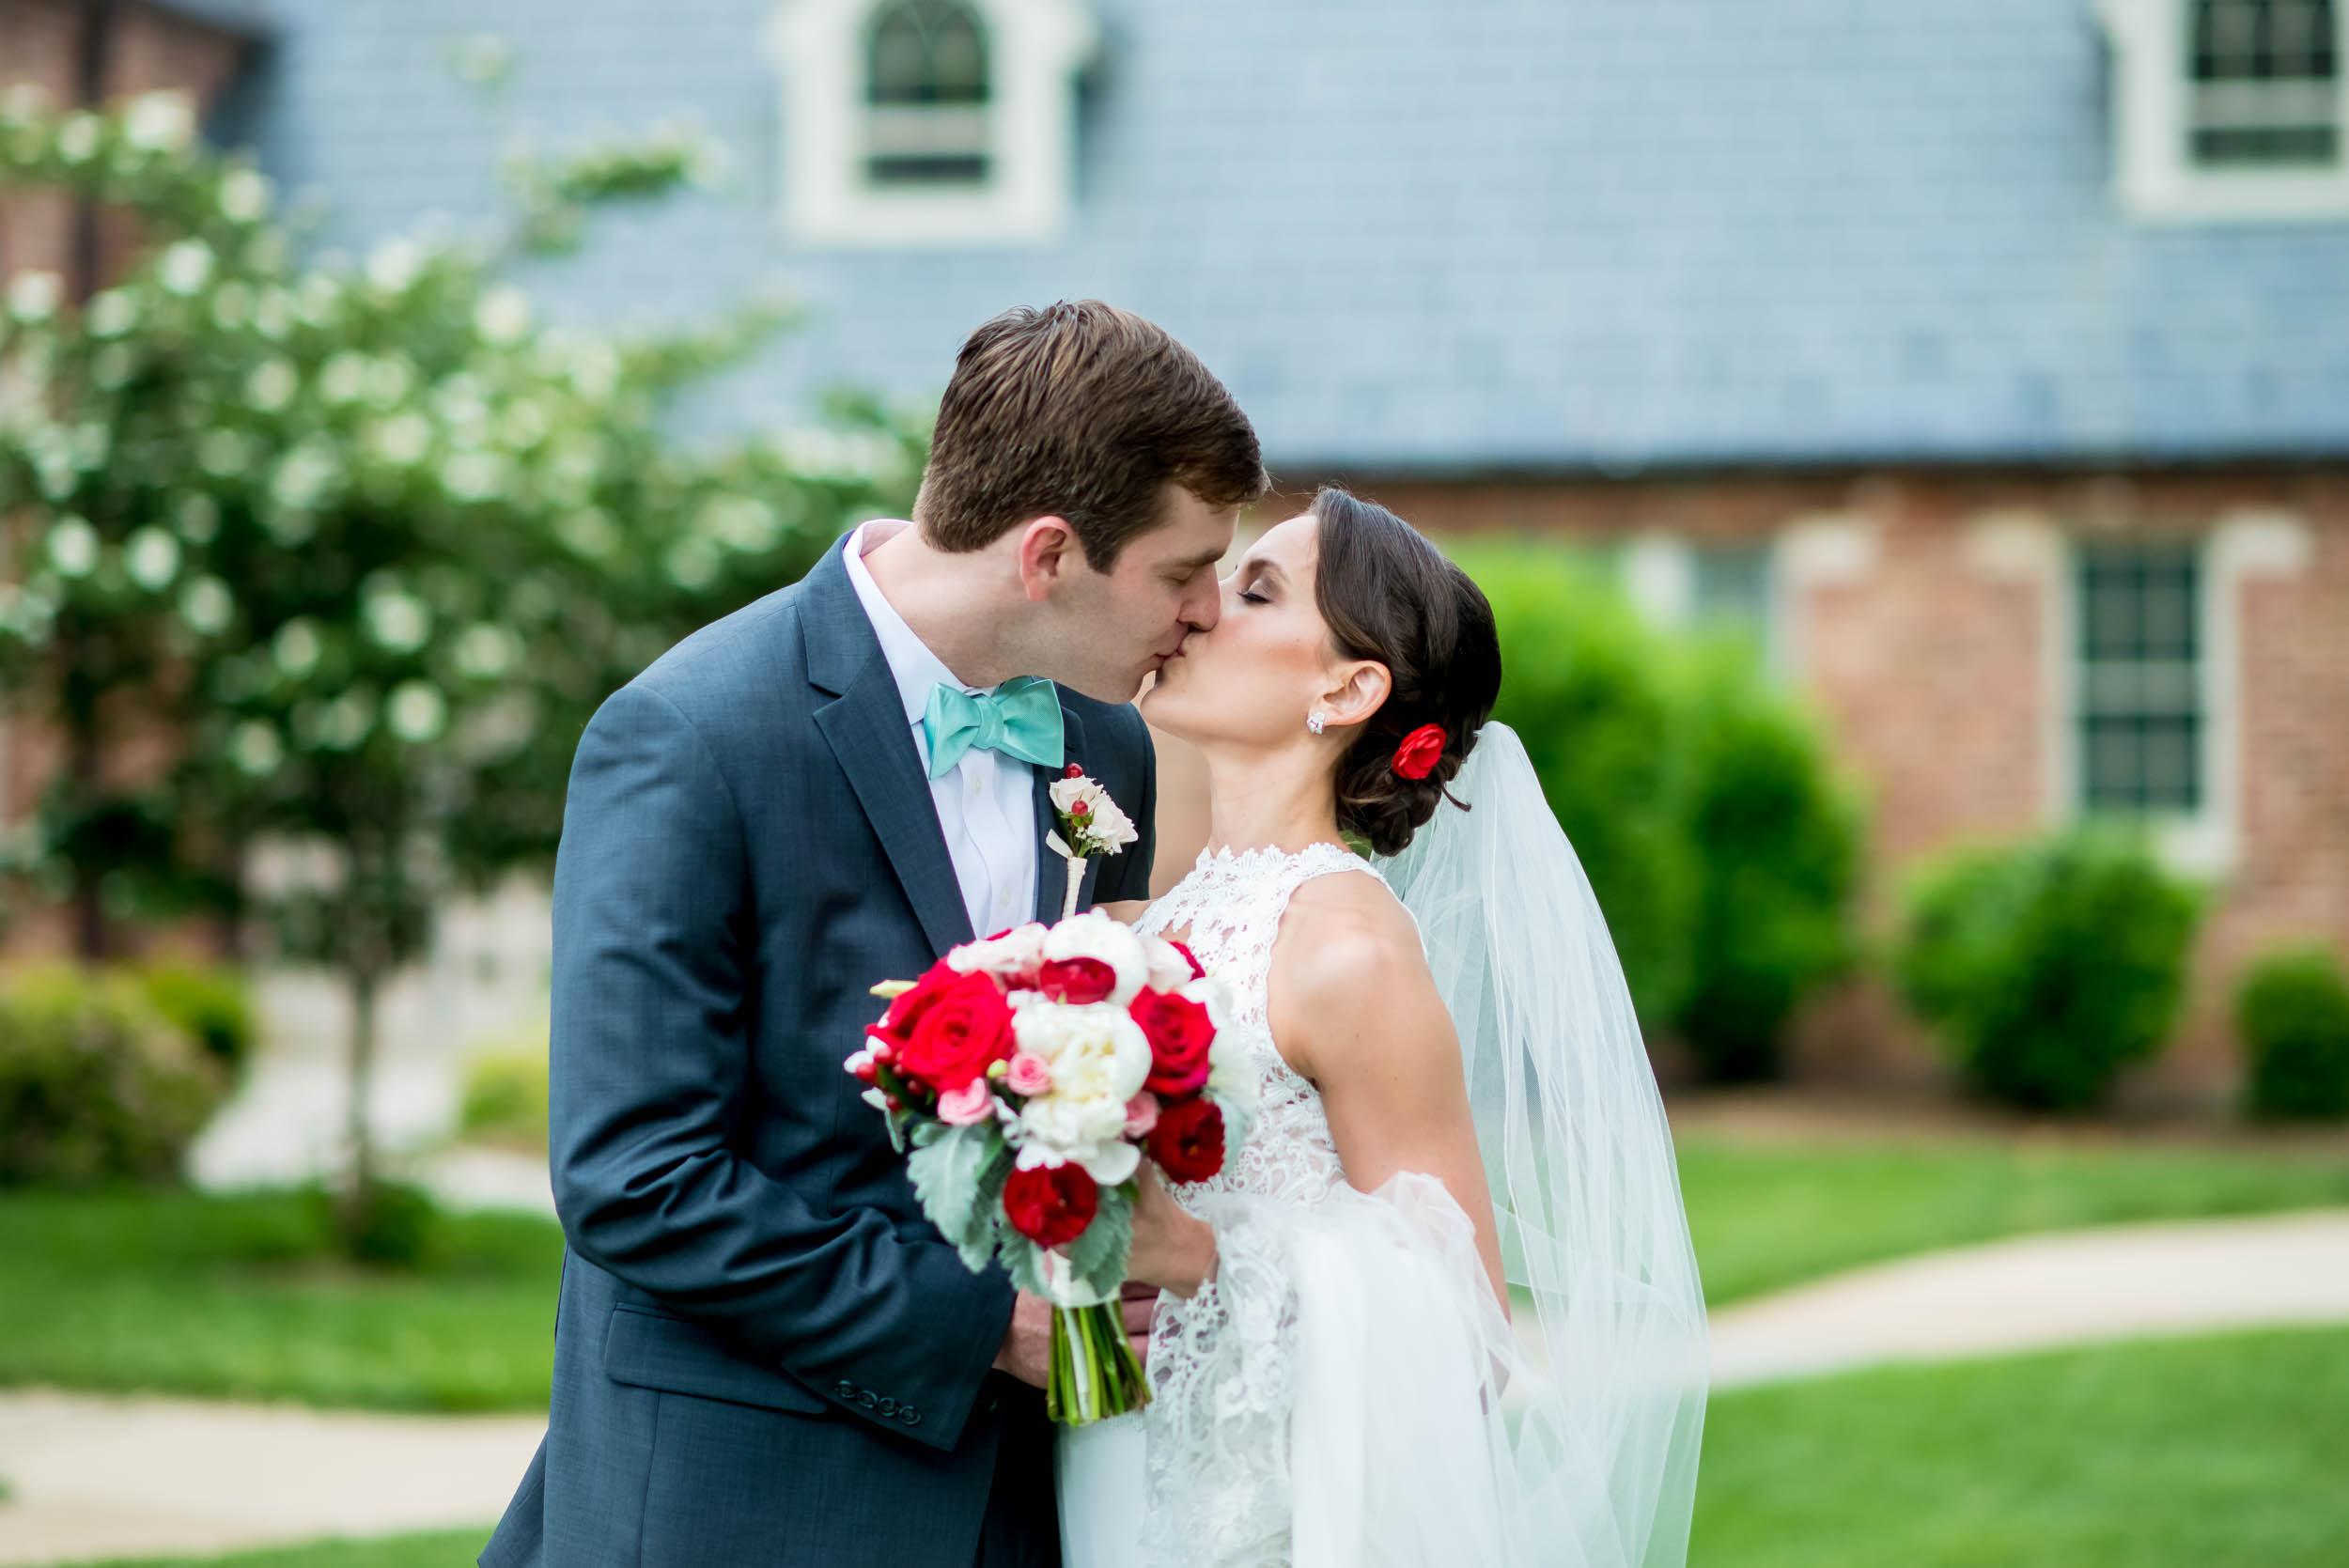 dc+metro+wedding+photographer+vadym+guliuk+photography+wedding+bride+and+groom-2054.jpg